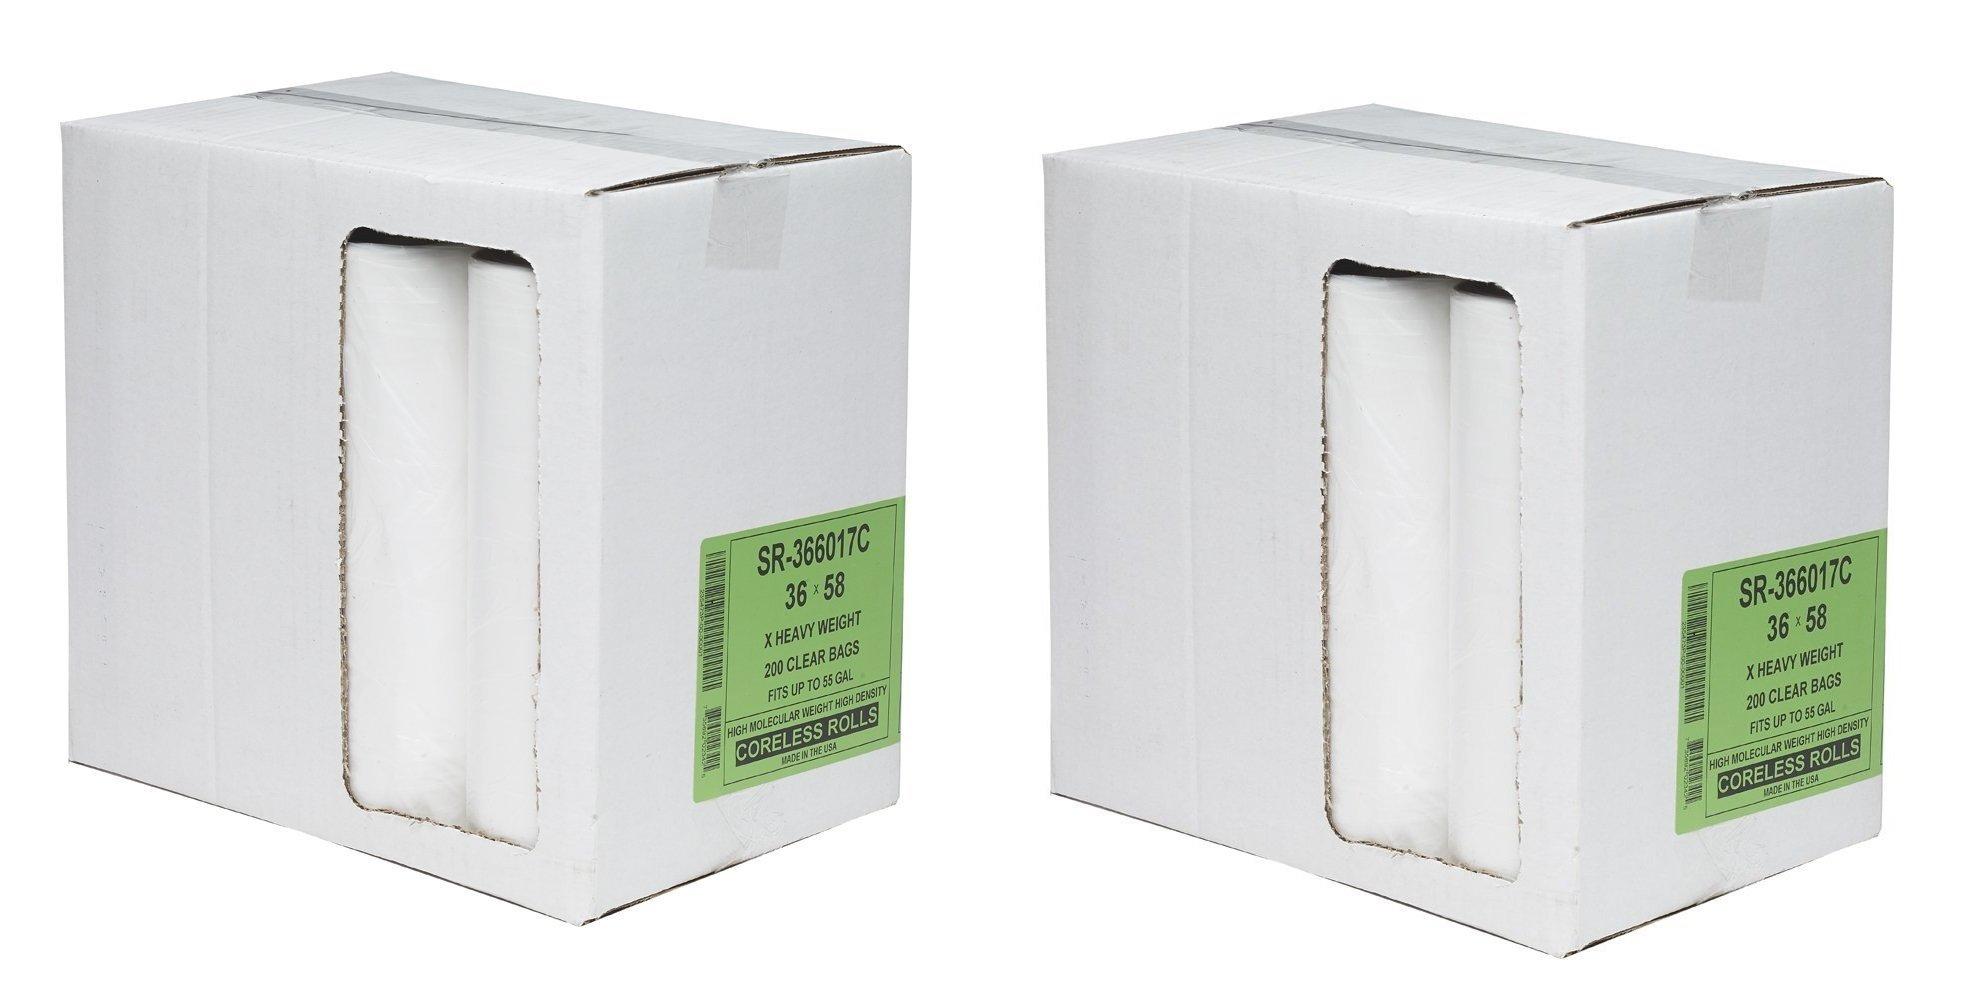 Aluf Plastics SR-366017C SR High Density Star Seal Roll Bag, 50-55 Gallon Capacity, 58'' Length x 36'' Width, Clear (Case of 200) (2 X Case of 200)